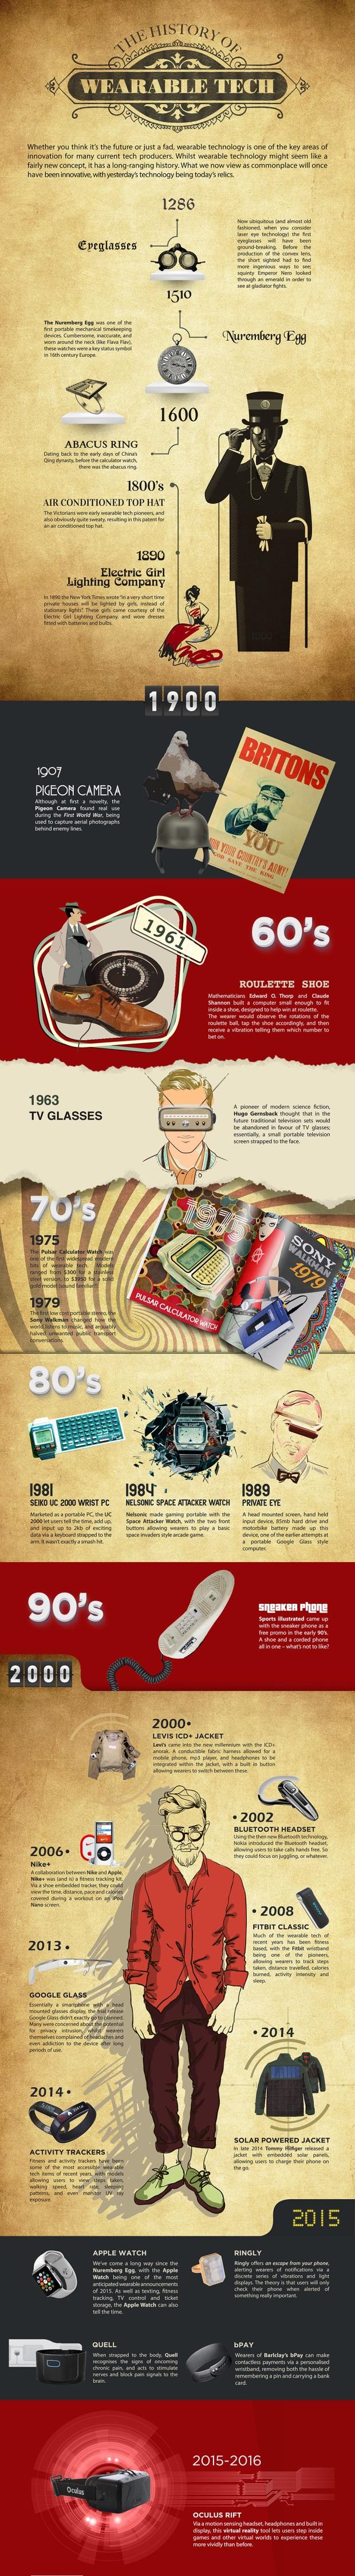 evolution of tech